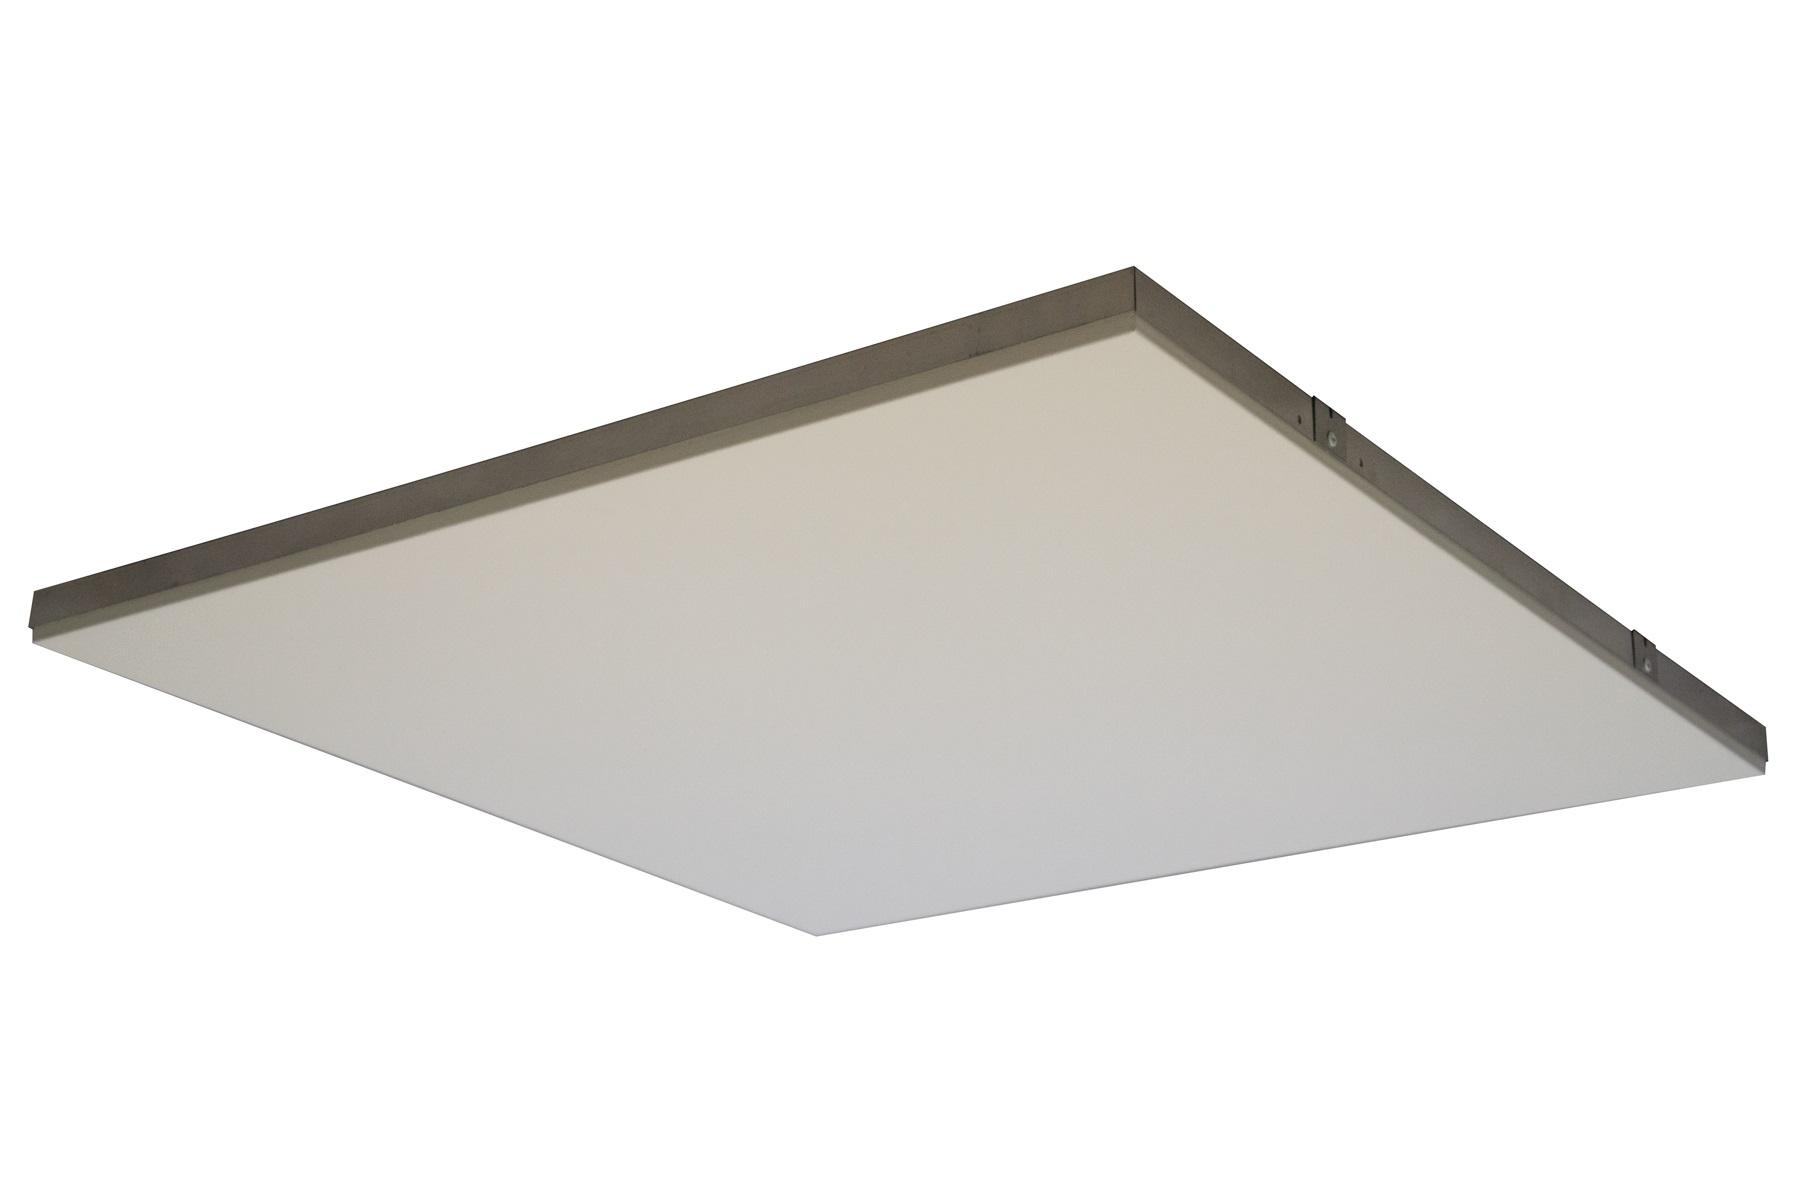 Qmark 250w At 120v Radiant Hidden Ceiling Panel Heater